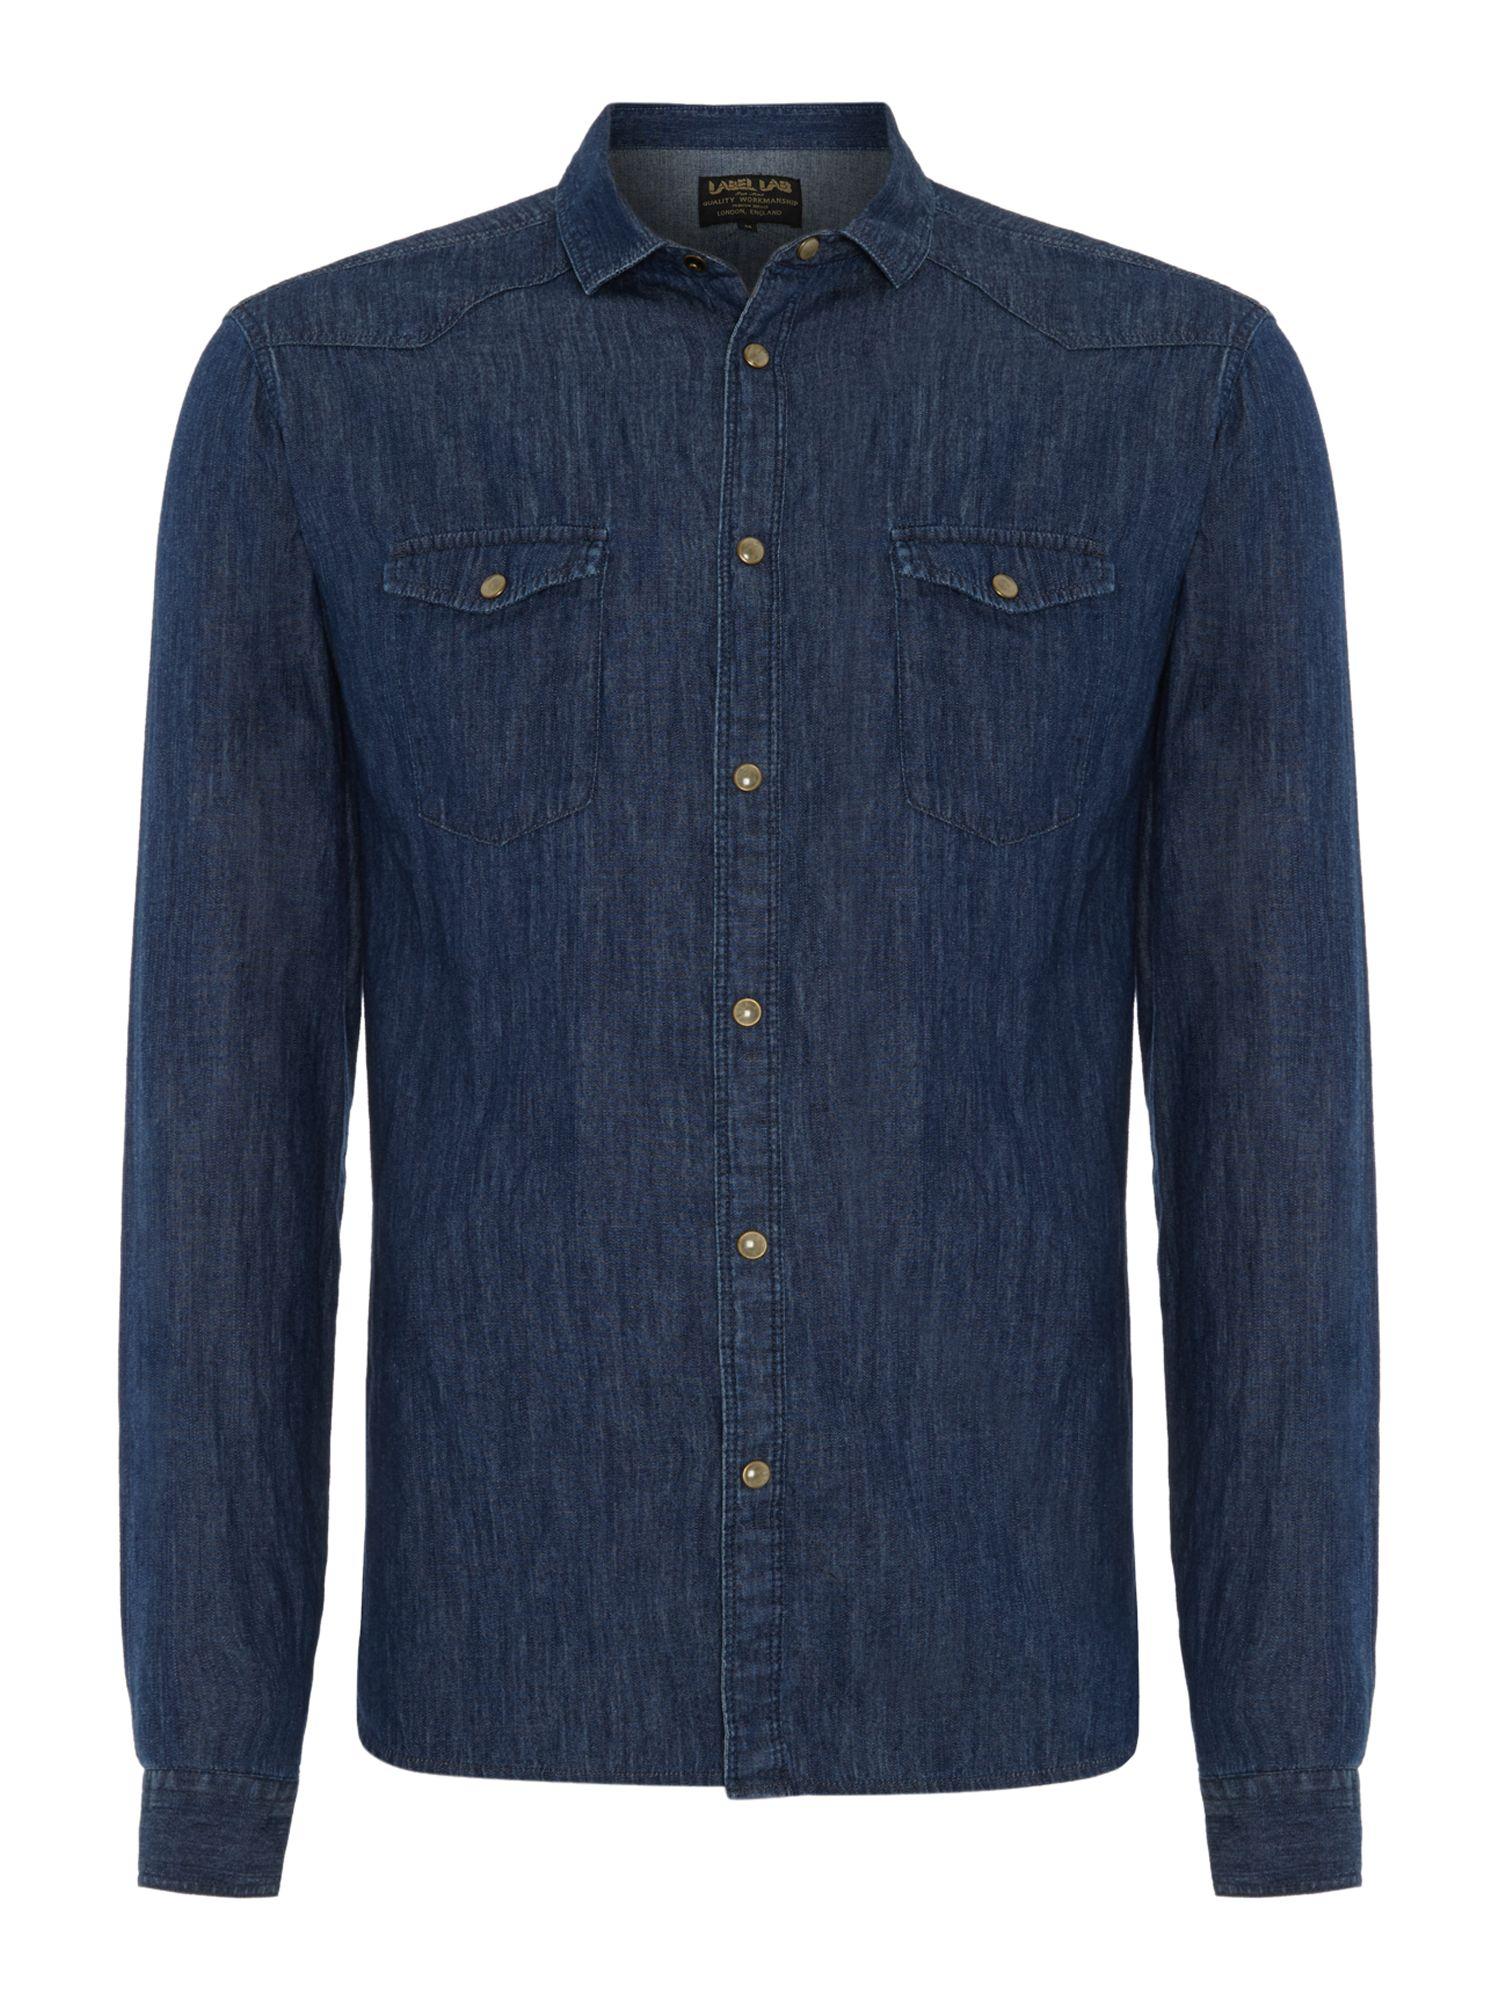 Label Lab Denim Long Sleeve Shirt In Blue For Men Indigo